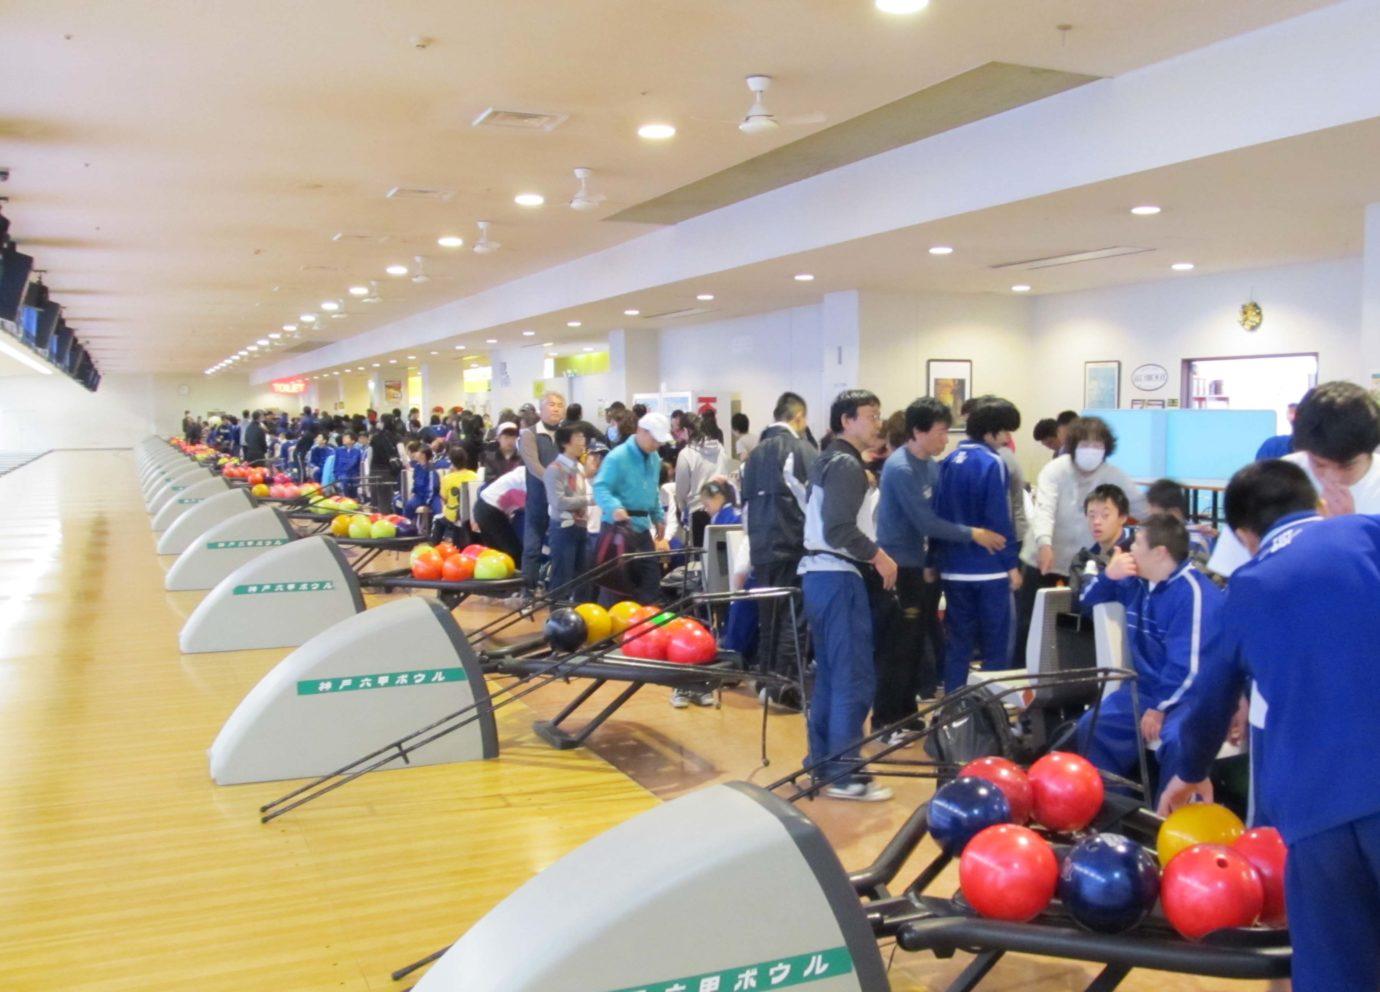 「神戸市立青陽東養護学校 招待ボウリング」開催   2015.12.11